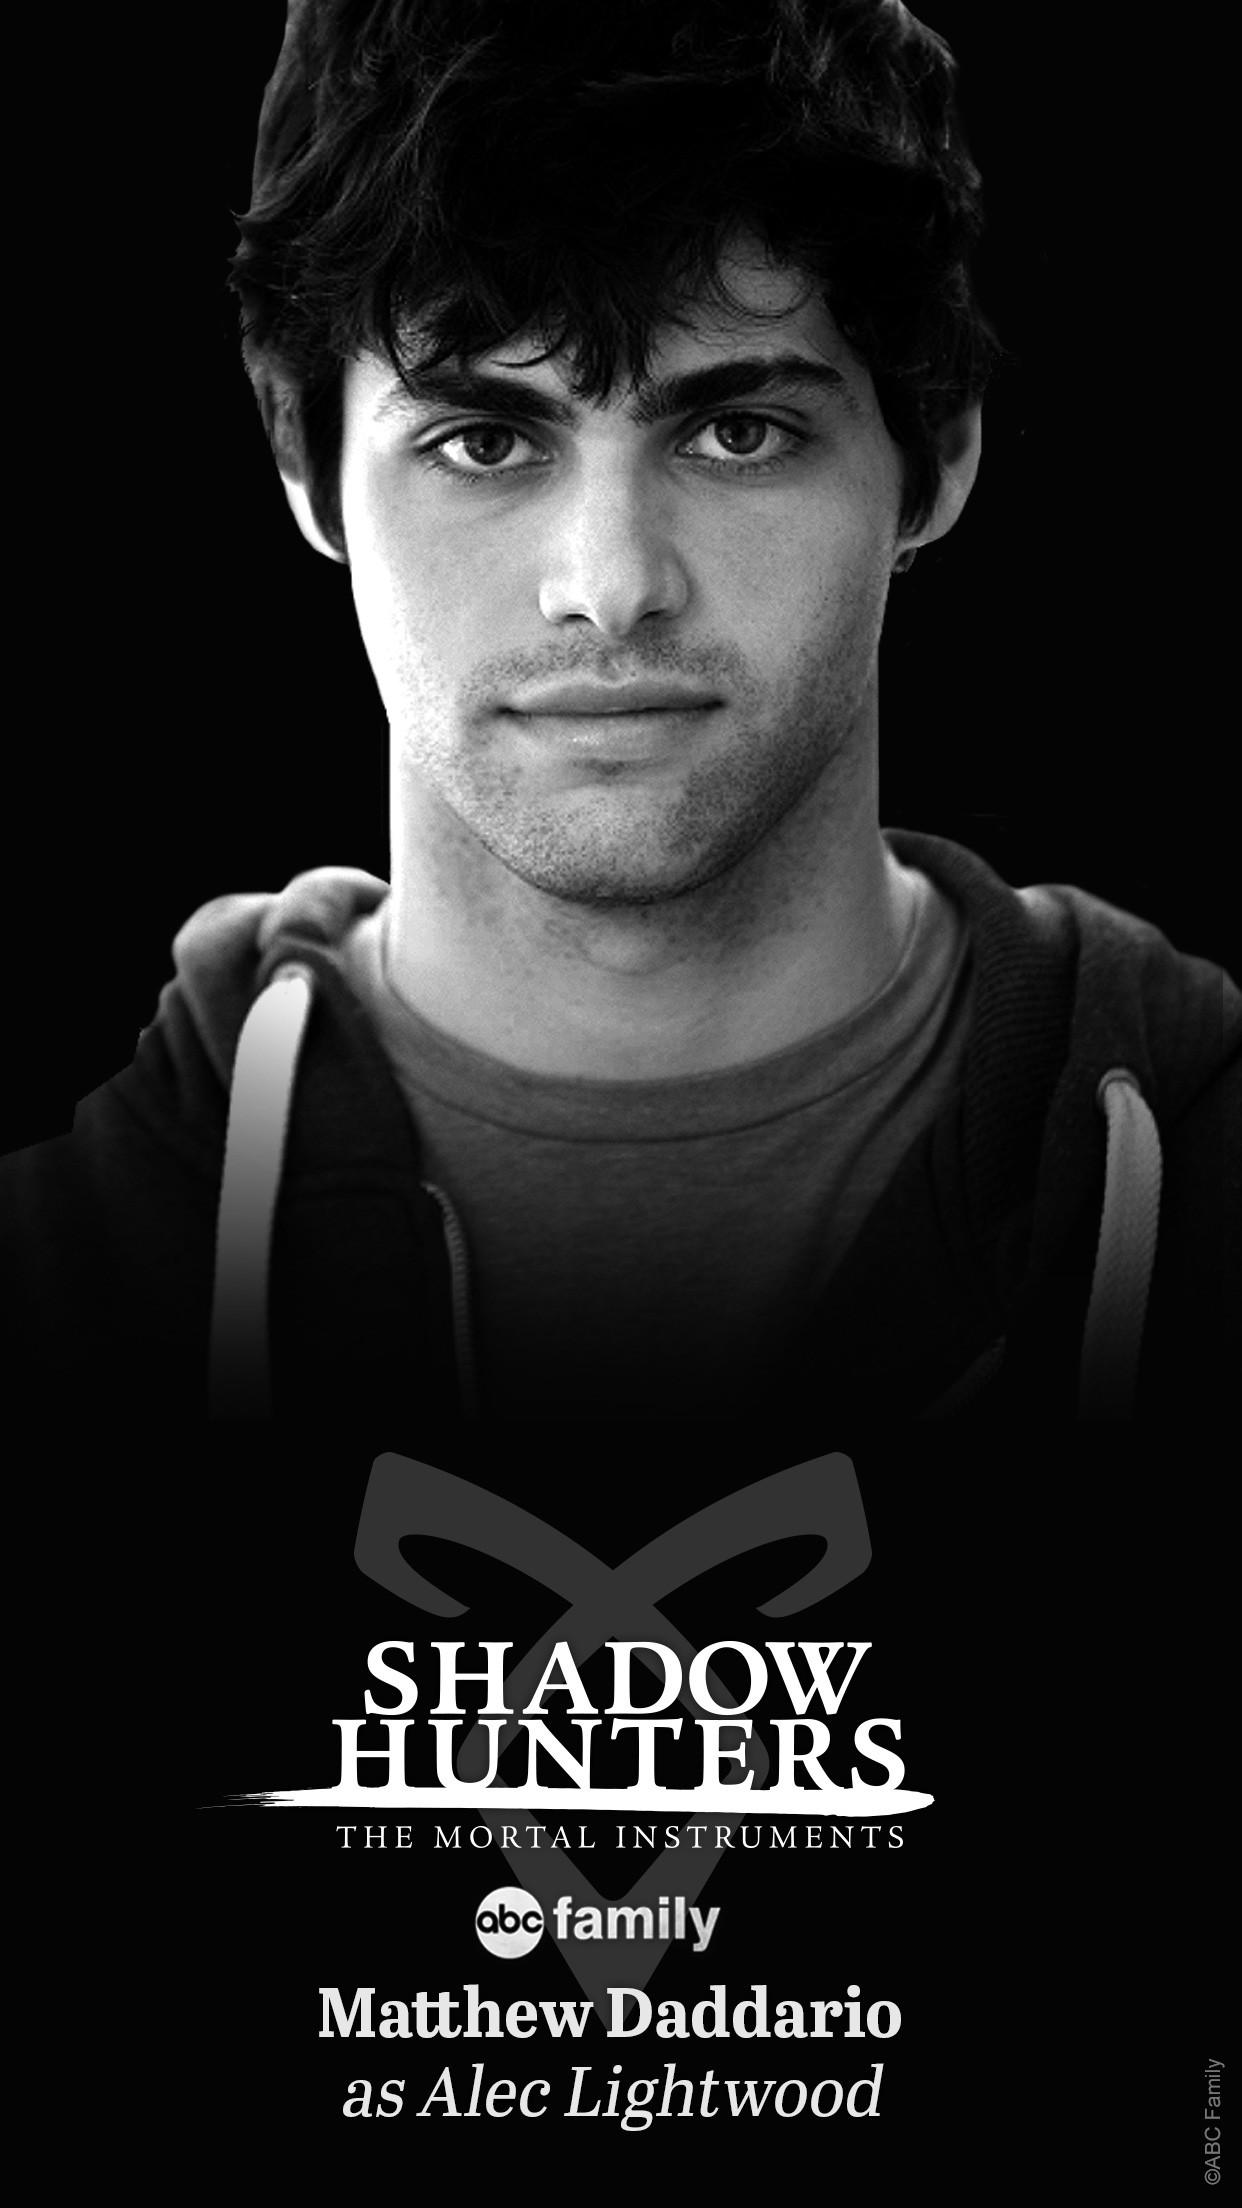 Shadowhunters Wallpaper 89 Images